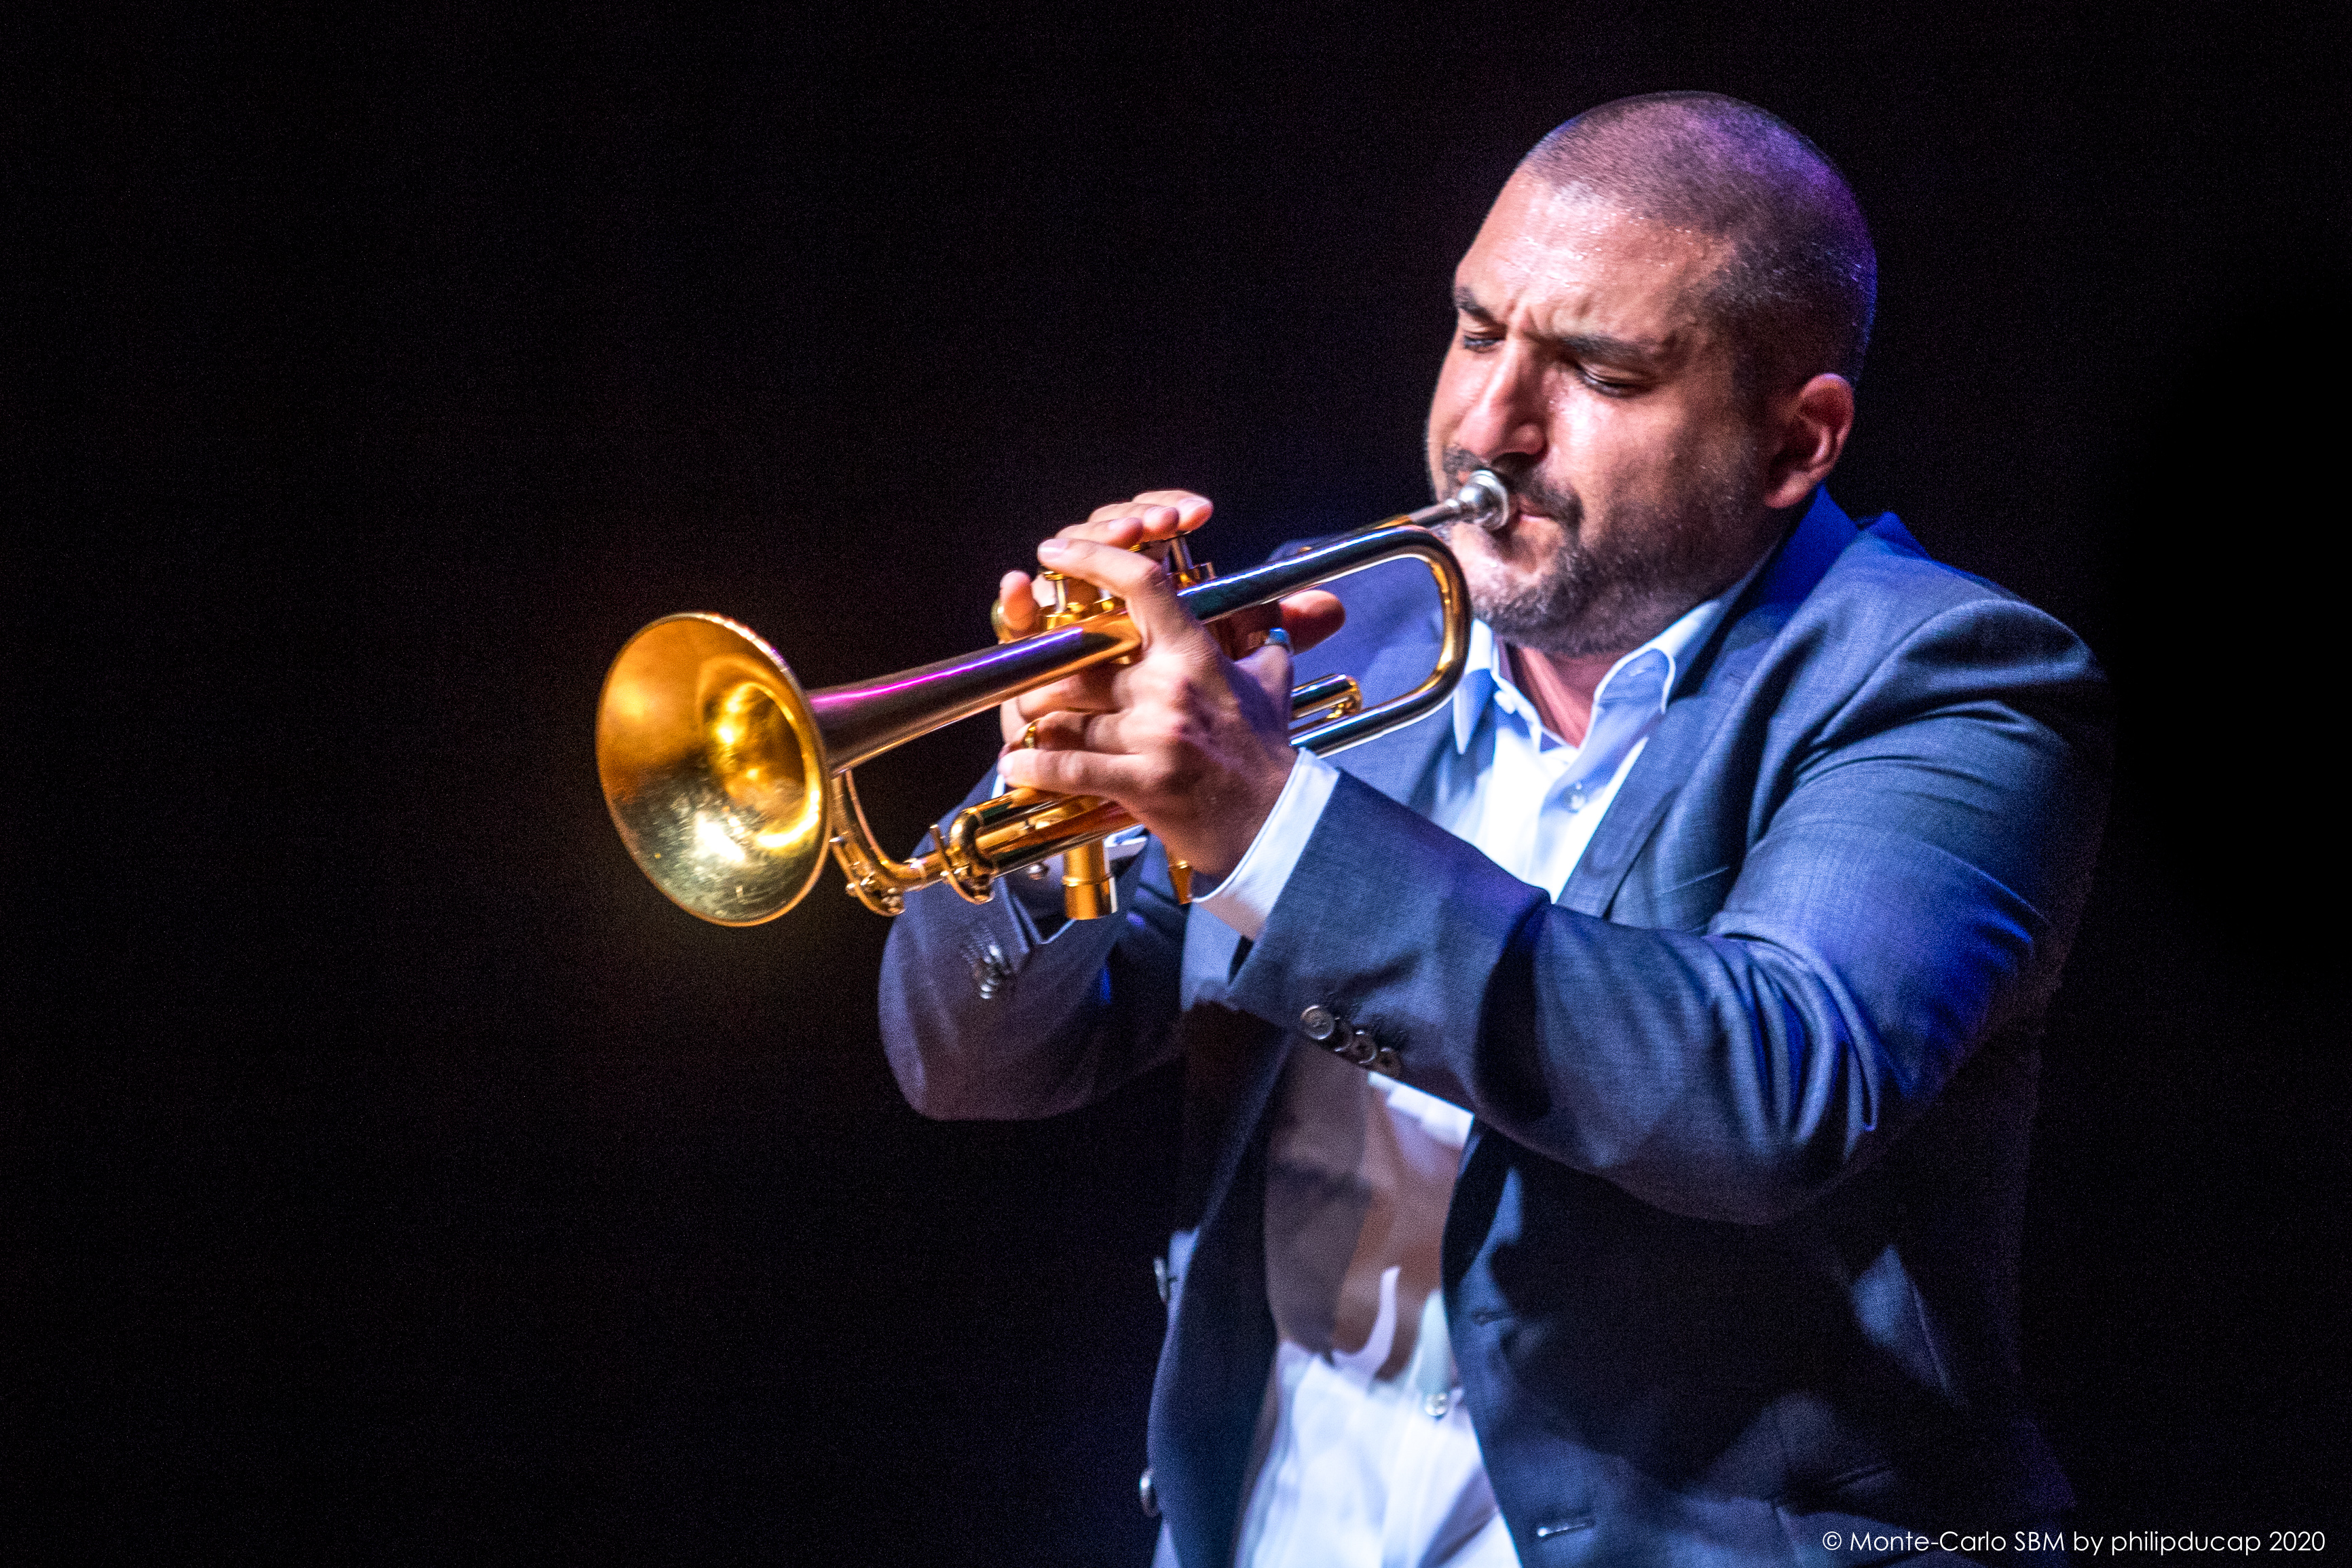 Ibrahim mallouf Monaco